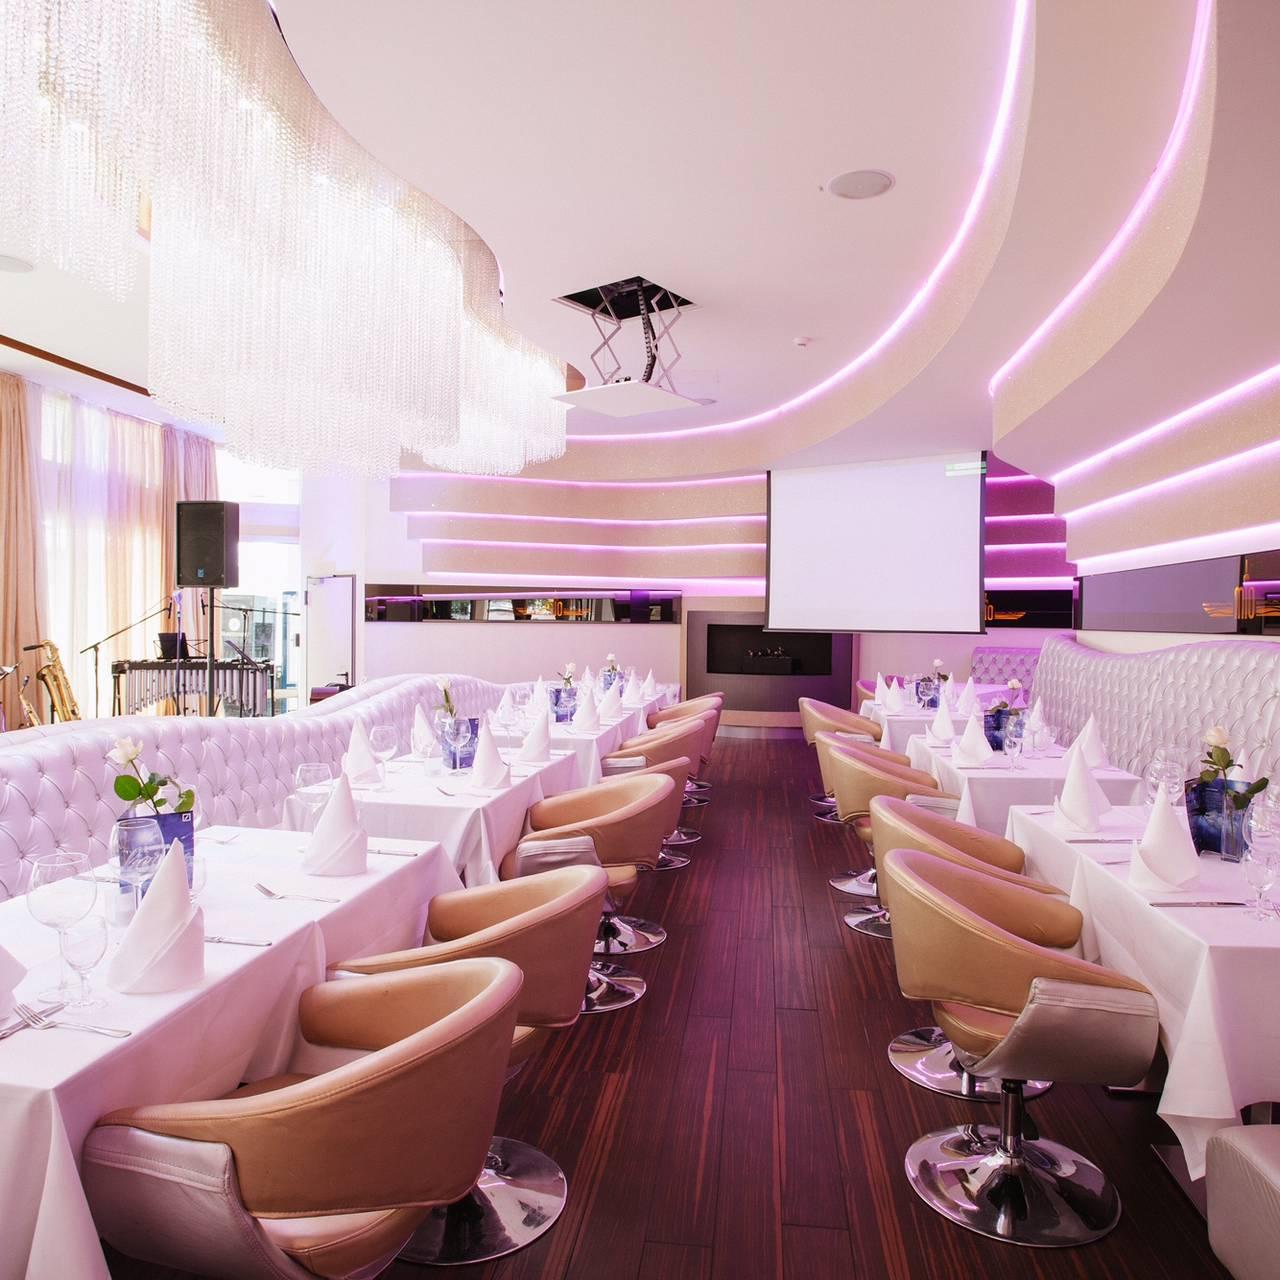 Mio - Restaurant, Bar, Events - Berlin, | OpenTable